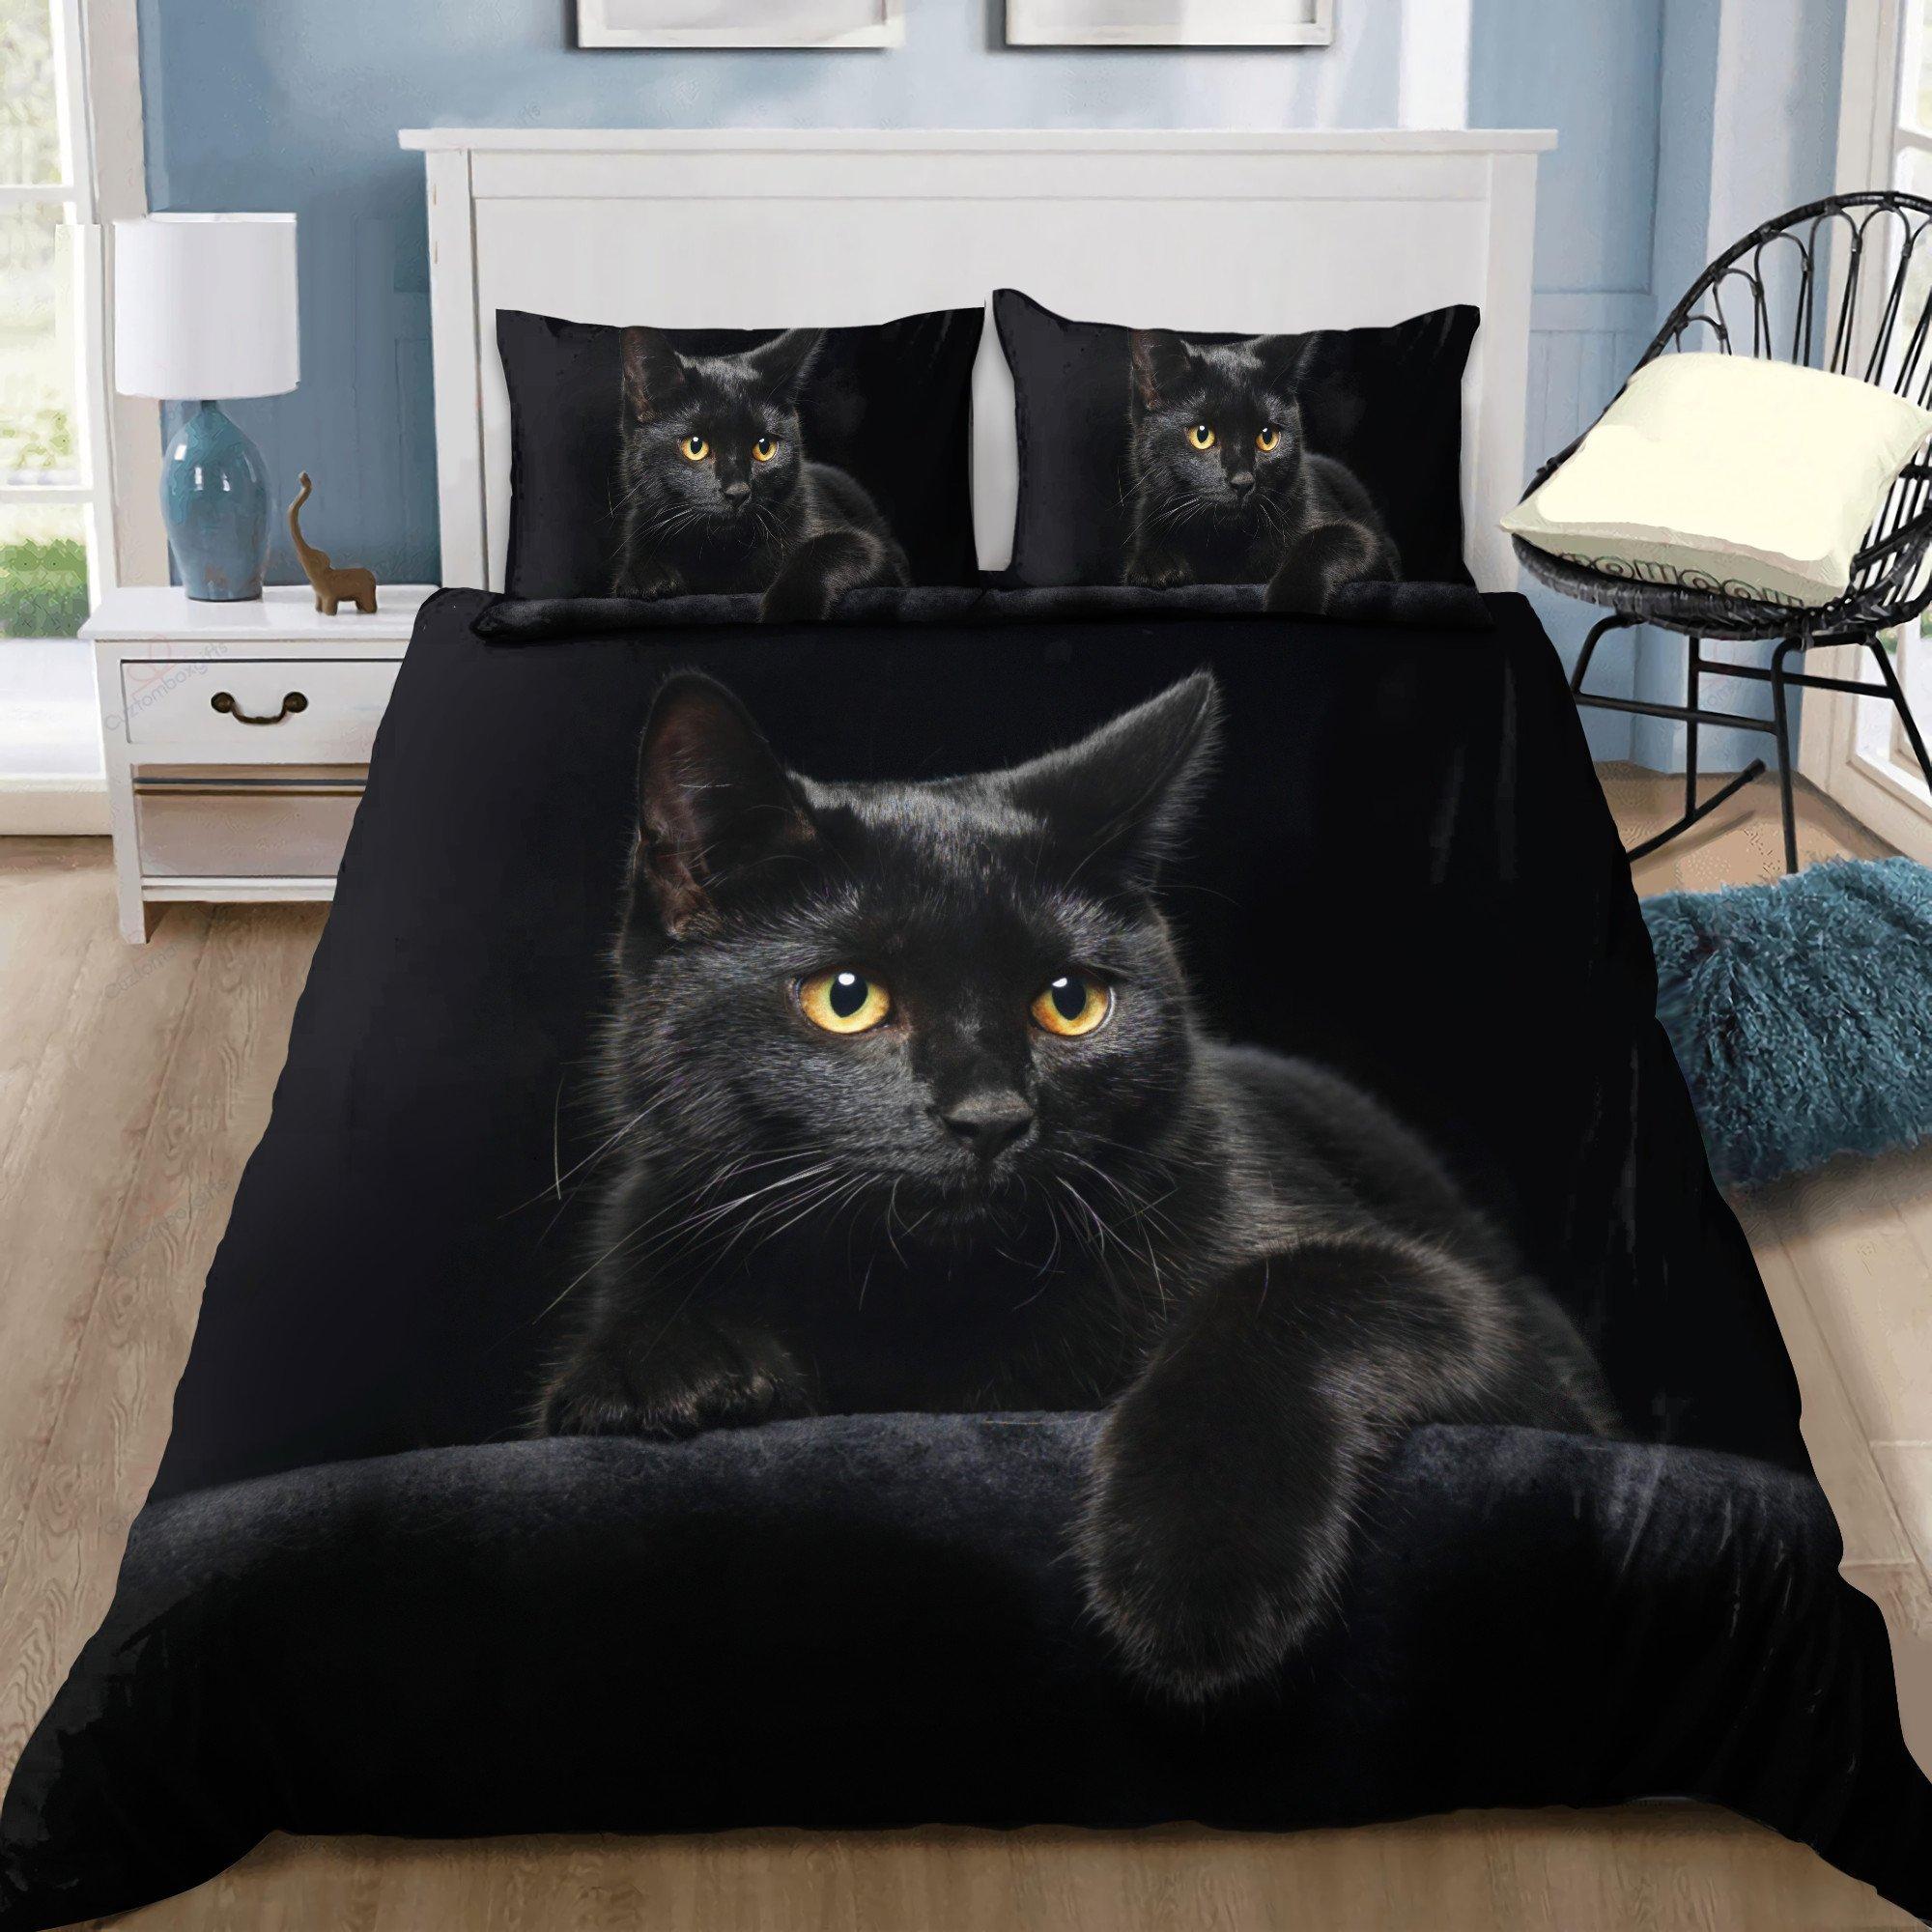 Black Cat Bedding Set 1